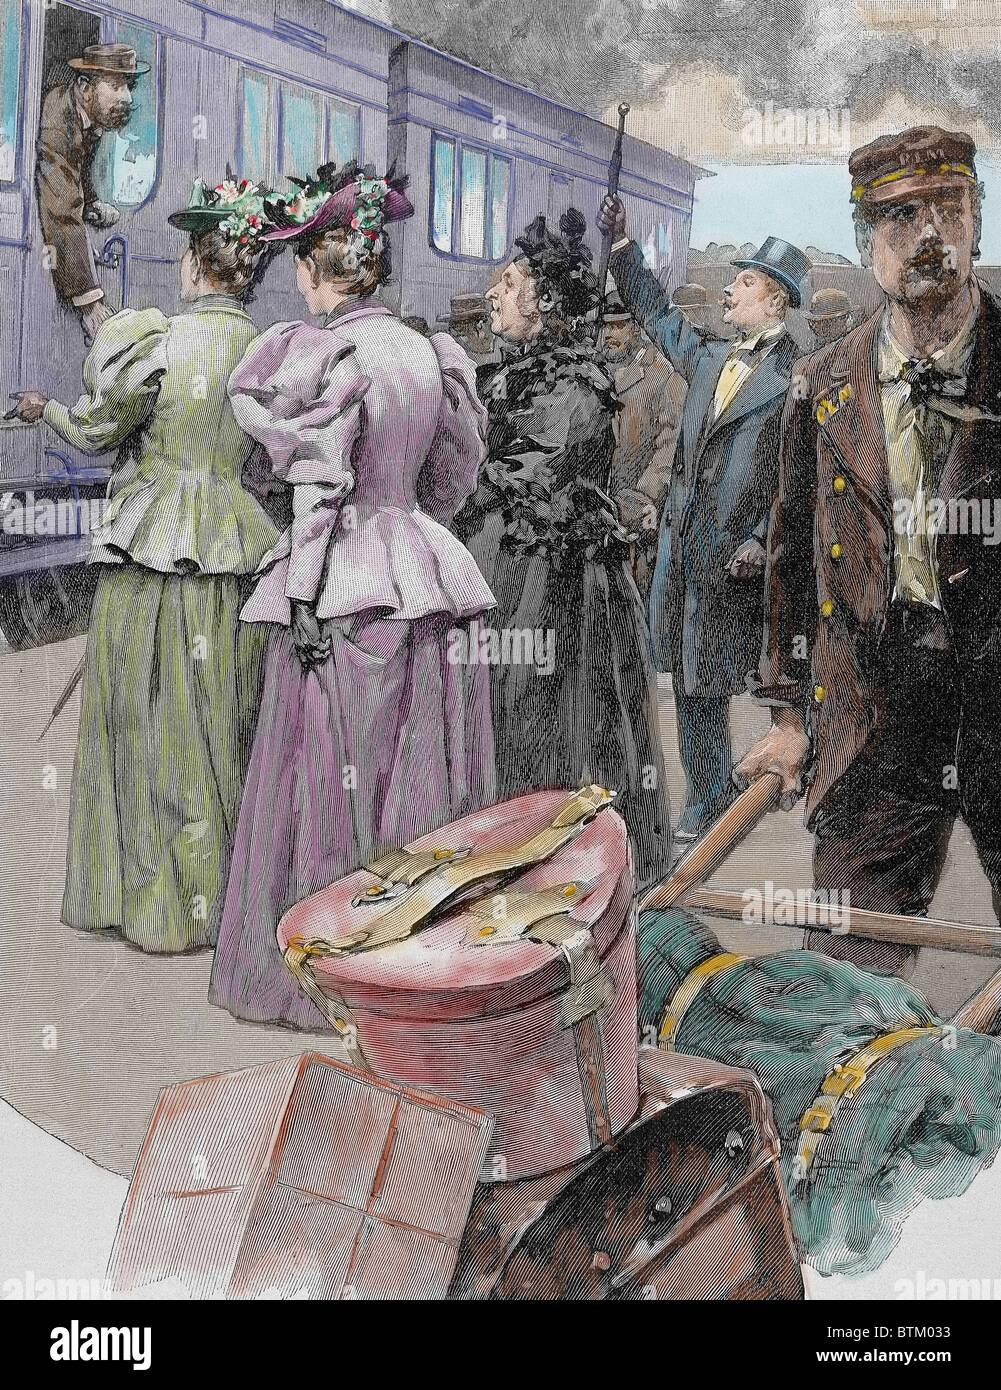 https://i0.wp.com/c7.alamy.com/comp/BTM033/platform-at-a-railway-station-late-19th-century-drawing-by-marchetti-BTM033.jpg